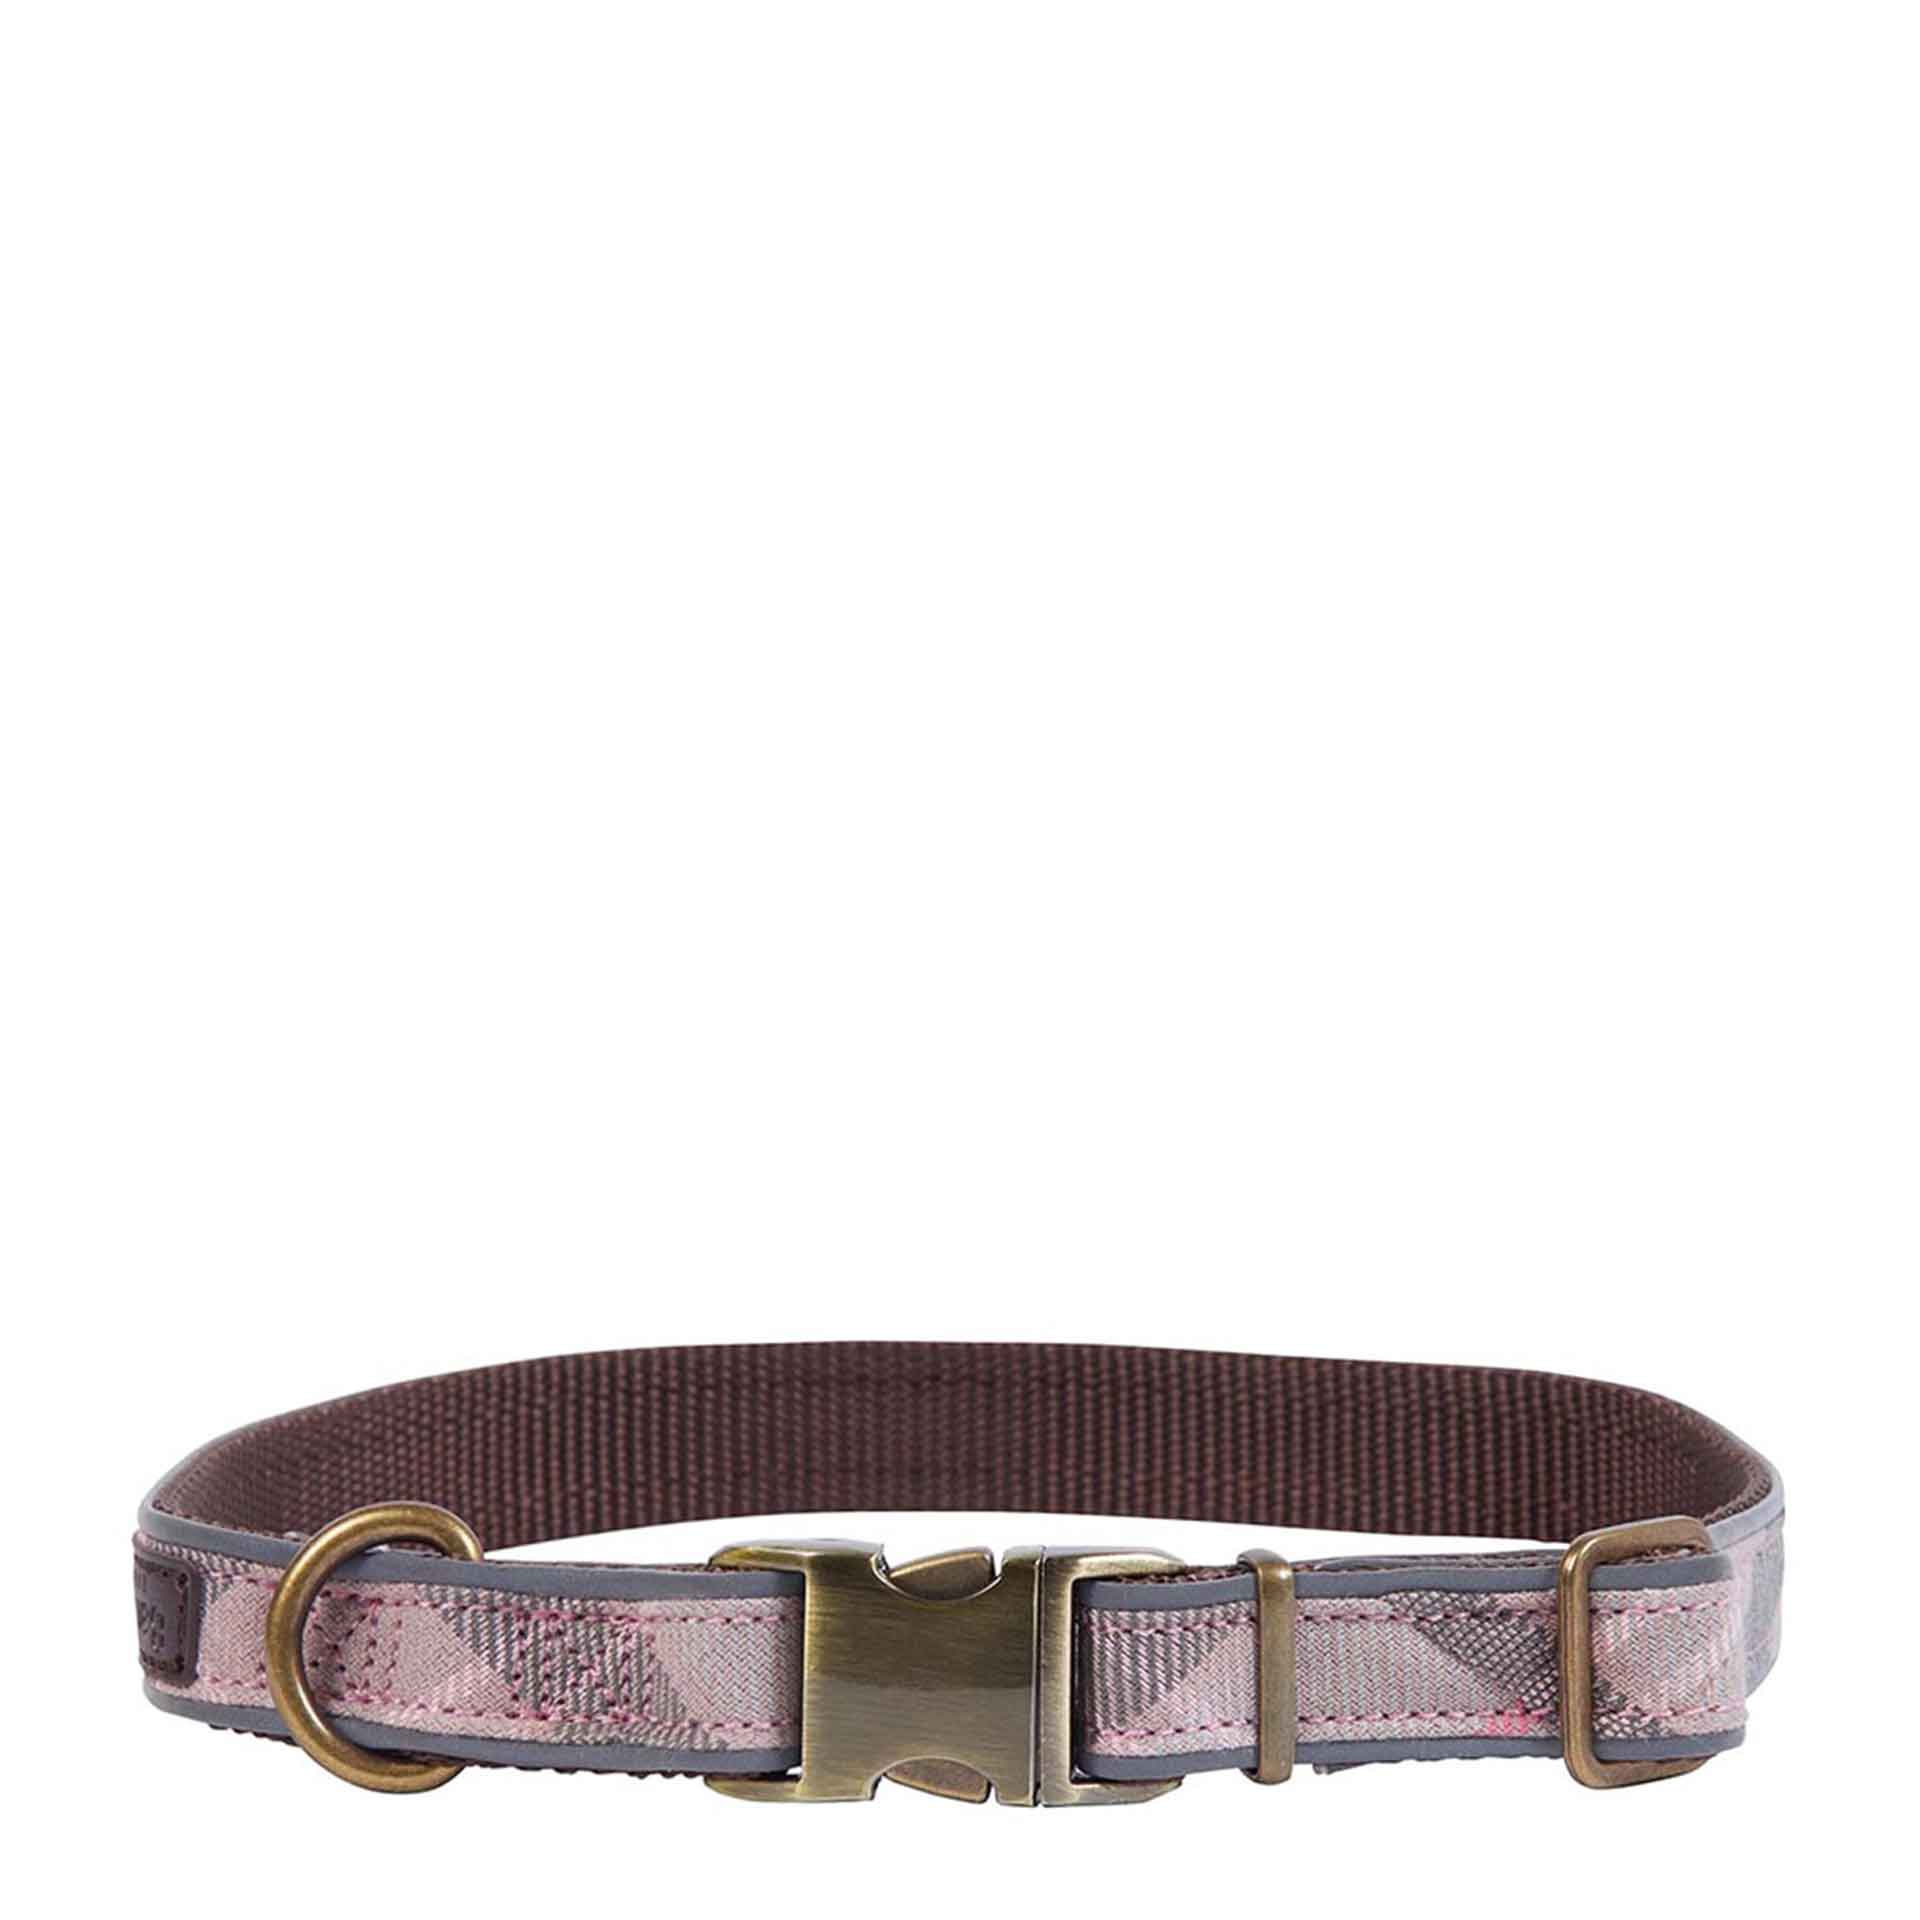 Barbour Reflective Tartan Hunde Halsband M taupe/pink tartan